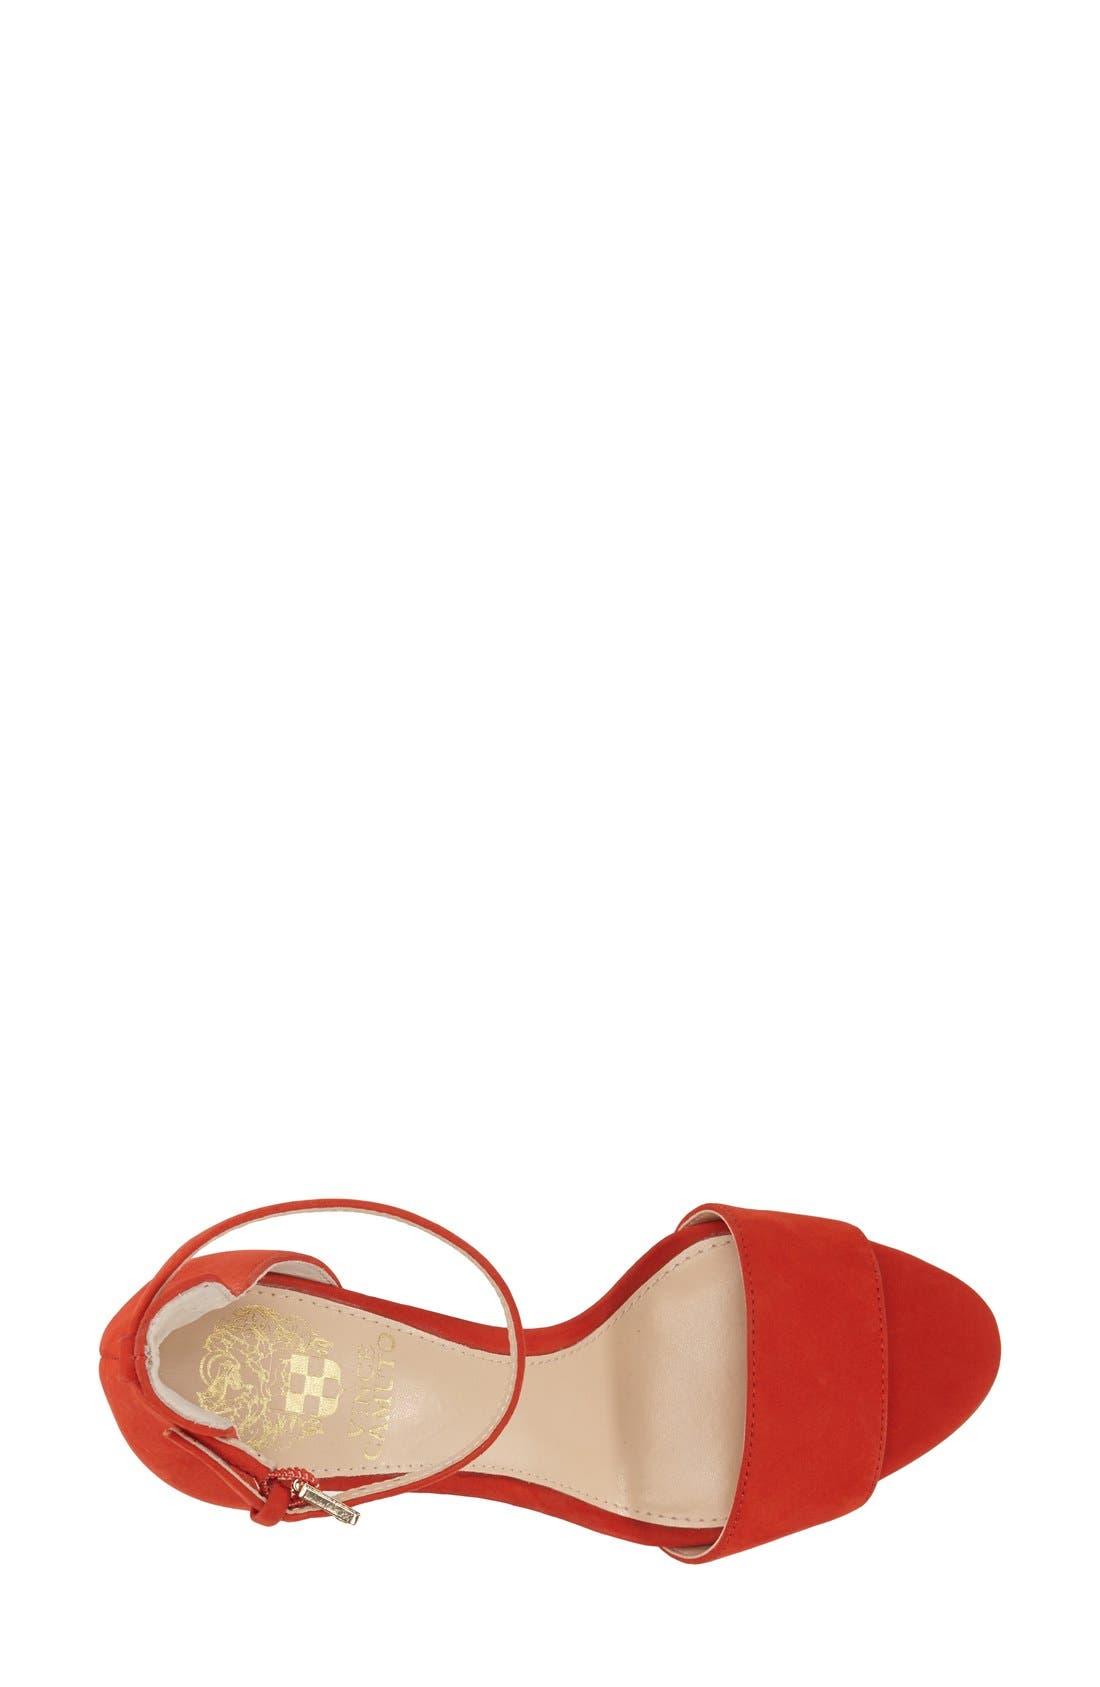 Alternate Image 3  - Vince Camuto 'Court' Ankle Strap Sandal (Women)